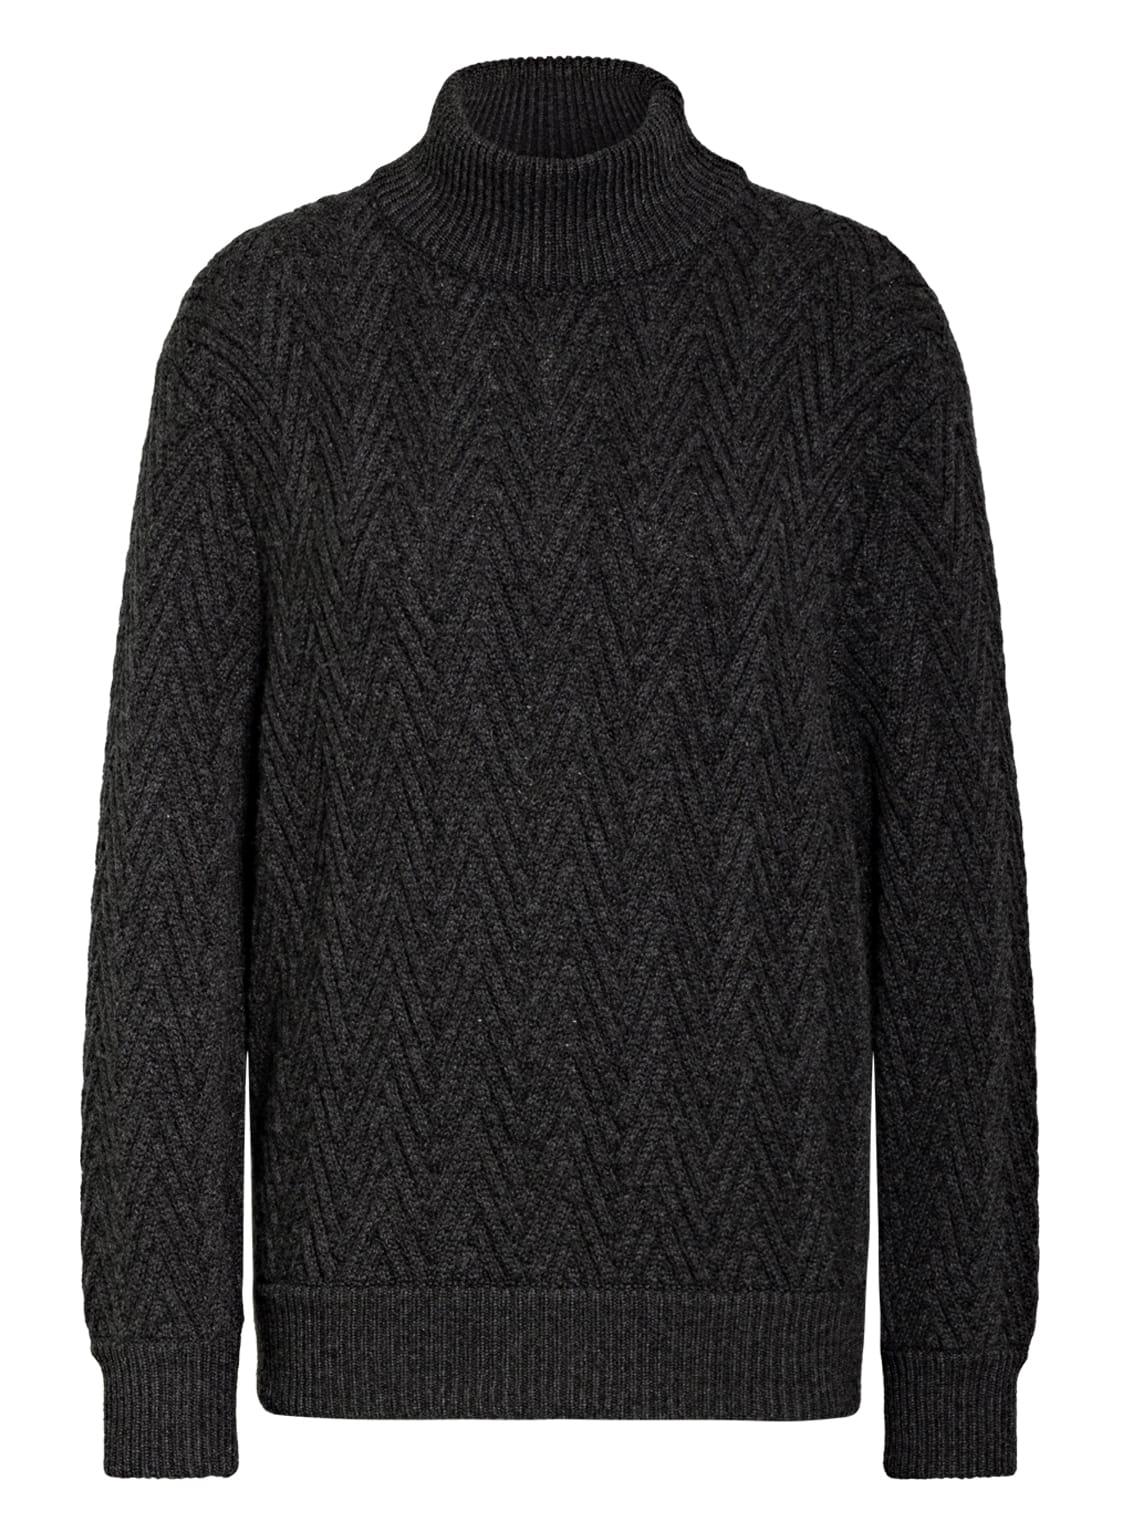 Image of Agnona Cashmere-Pullover grau